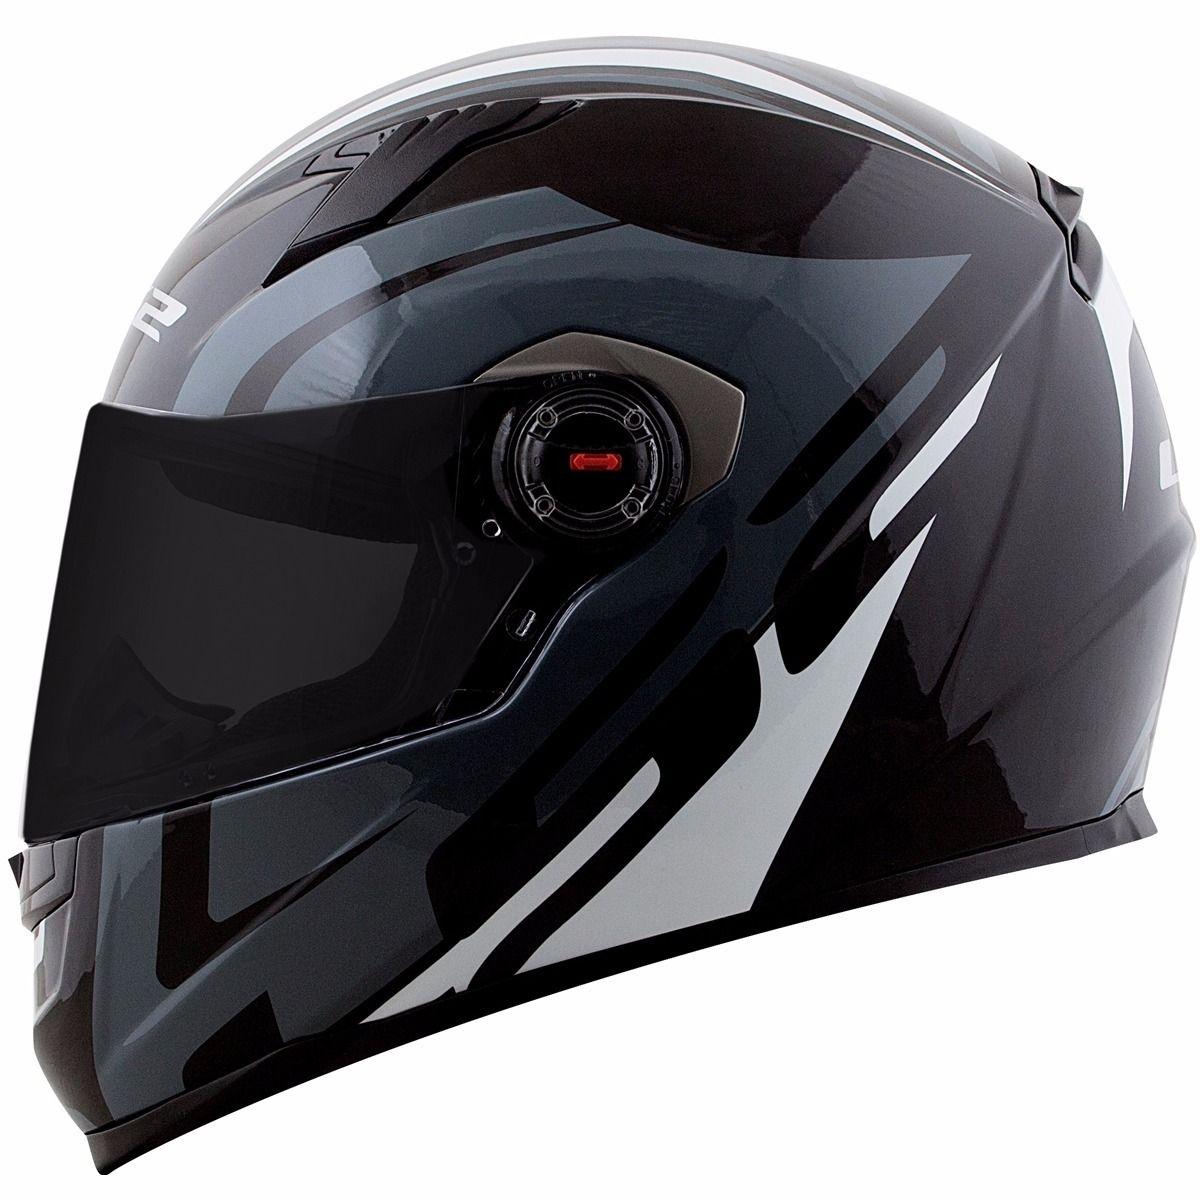 Capacete LS2 FF358 Touring  (Preto/Branco)  - Nova Centro Boutique Roupas para Motociclistas